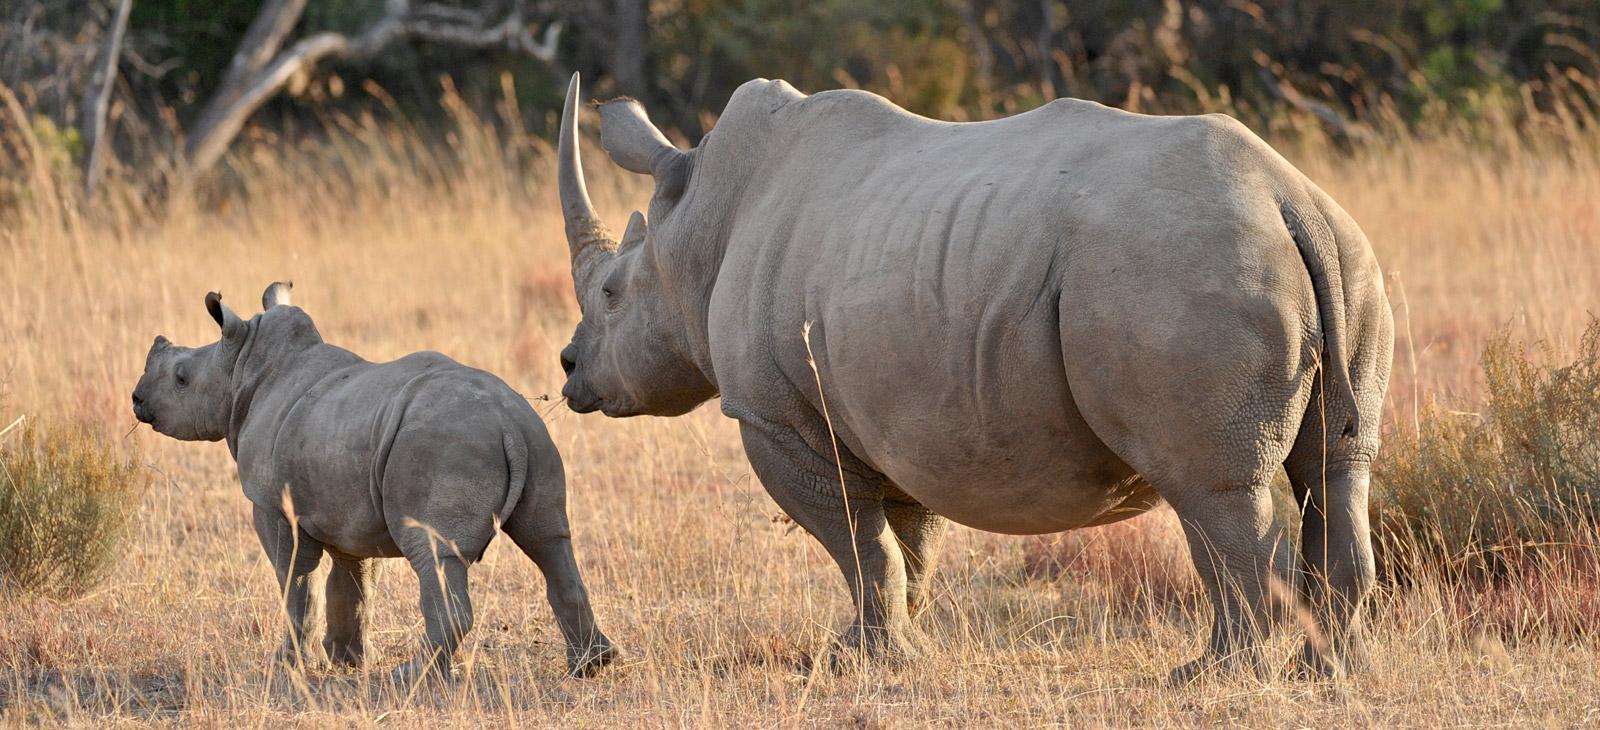 rhino-mother-and-calf-2-Dex-Kotze-